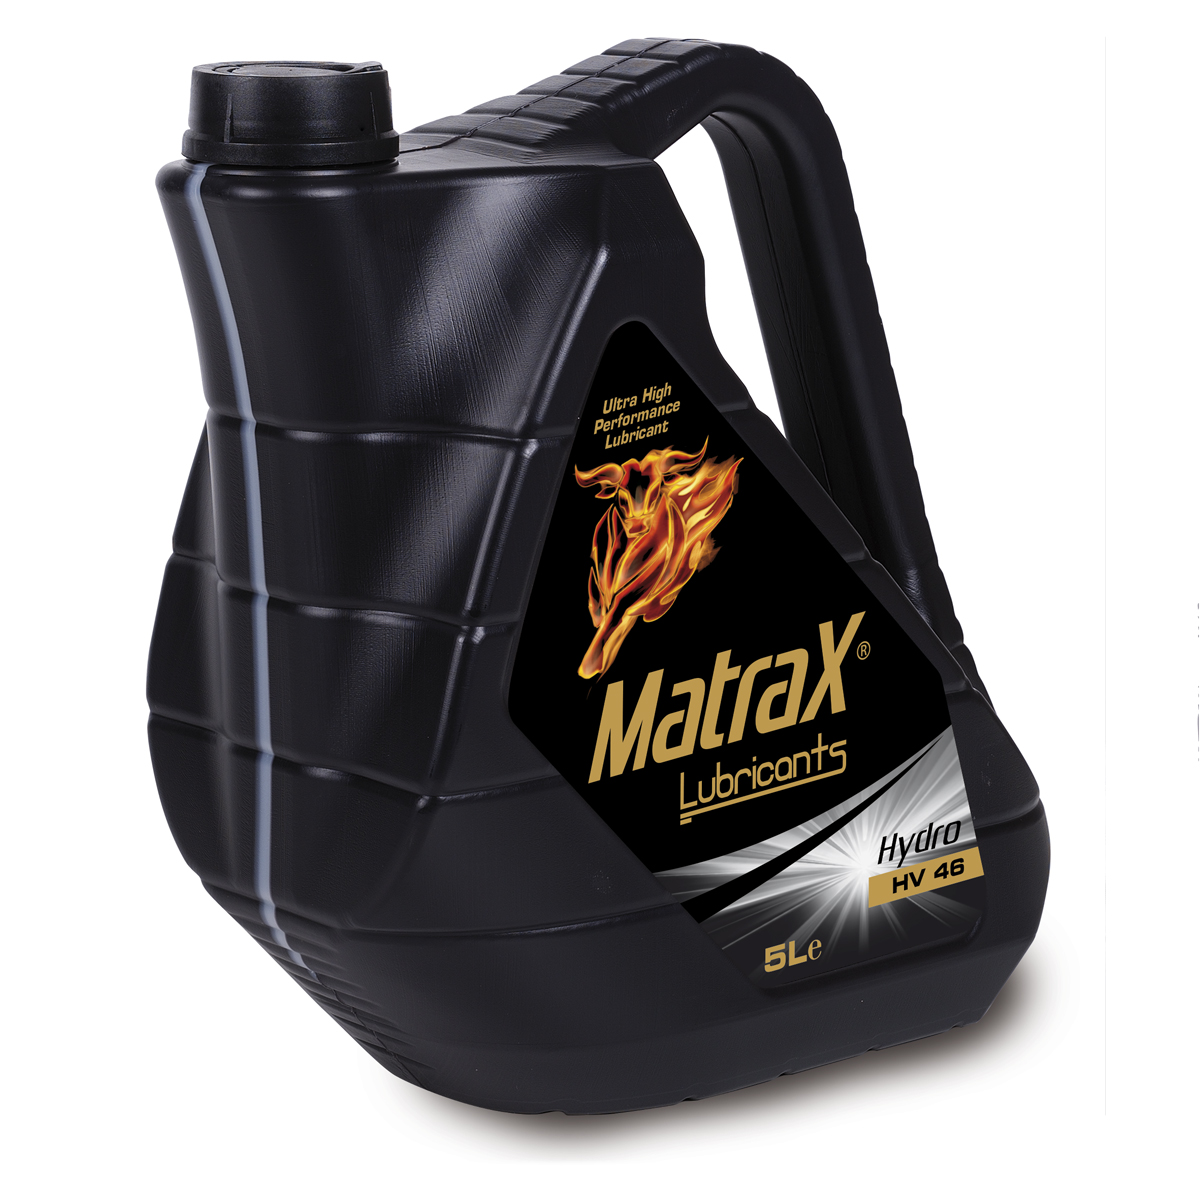 MatraX Hydro HV 46